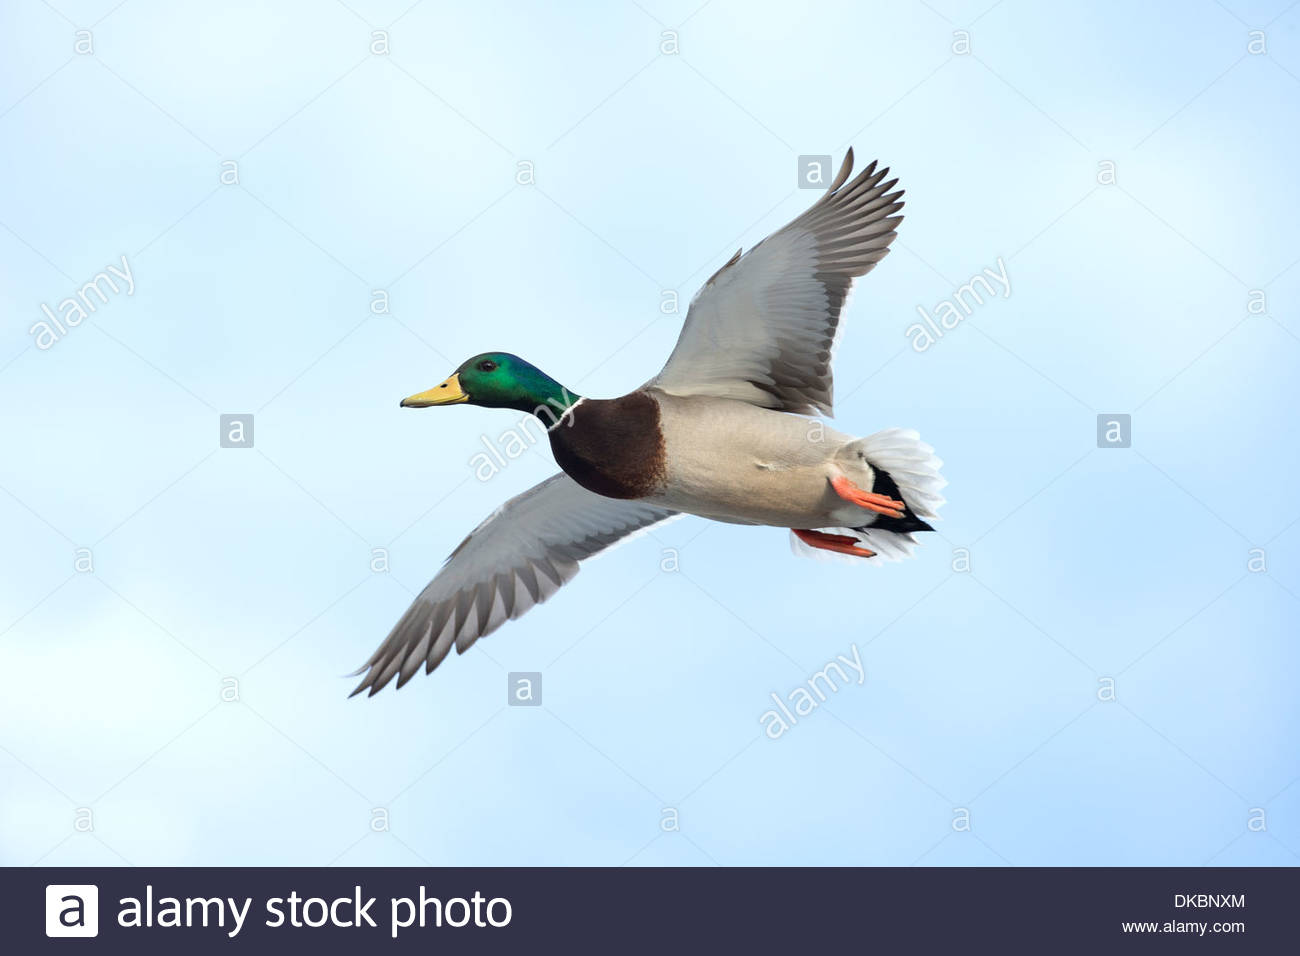 Mallard Duck; Anas platyrhynchos - Stock Image